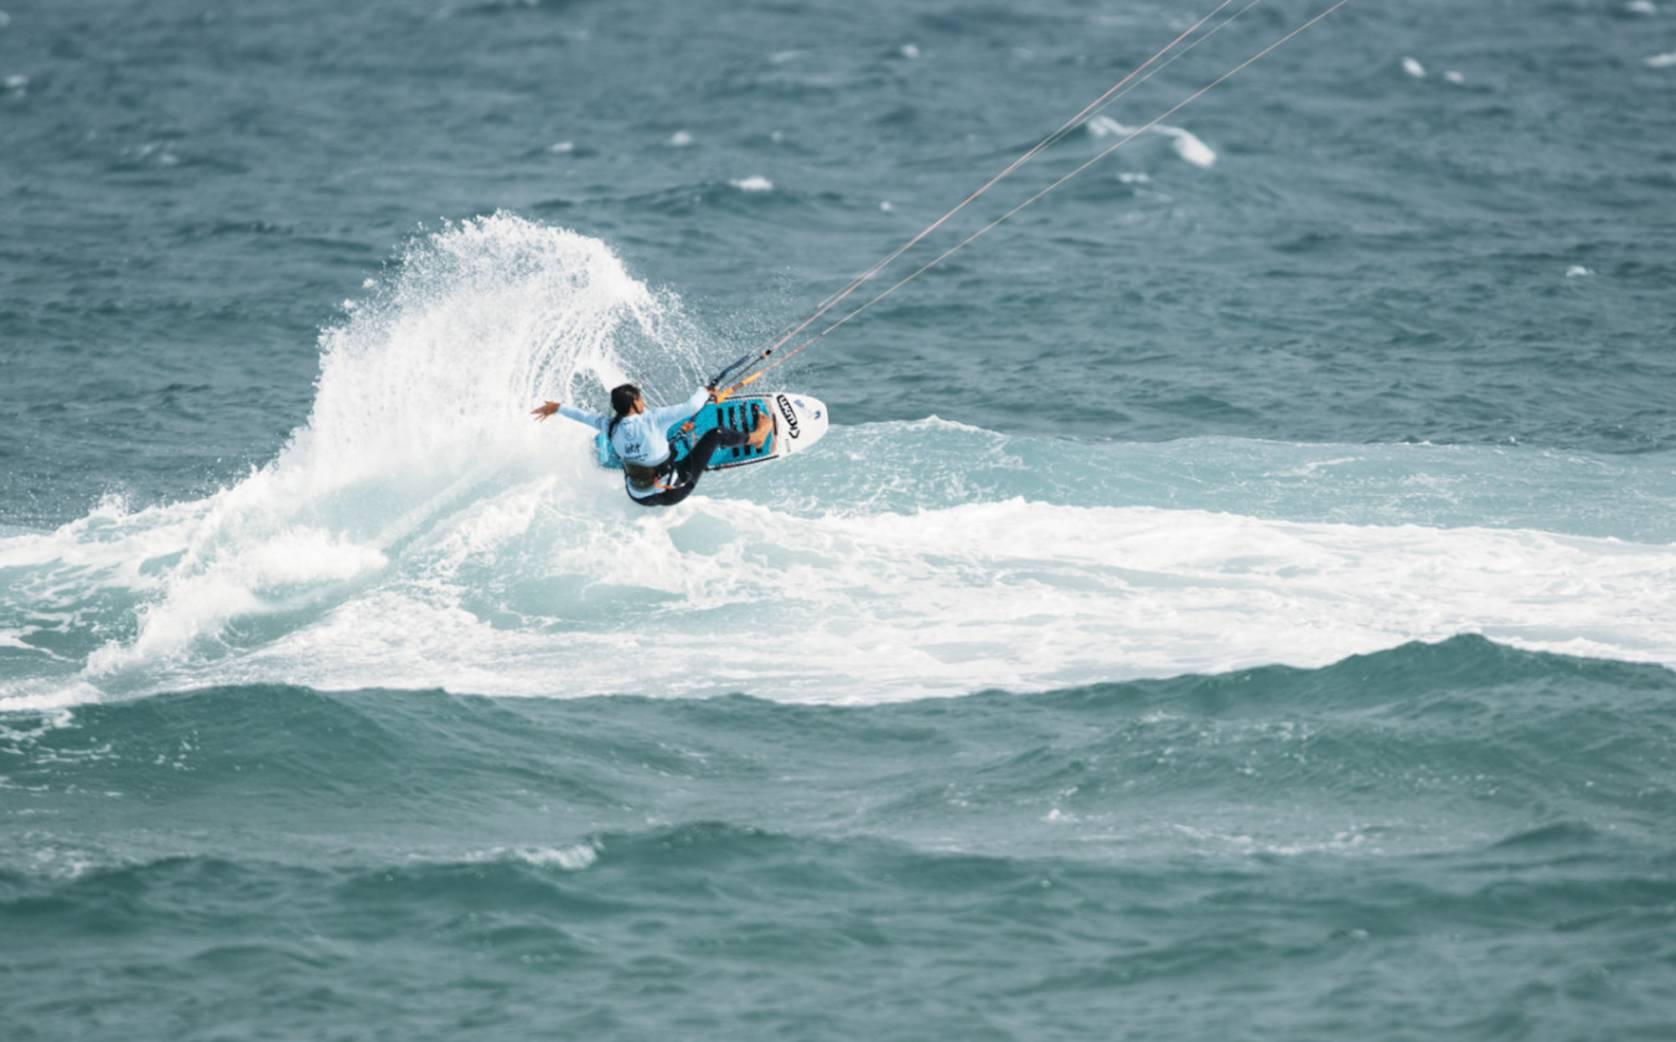 kite surfer hitting crest of wave